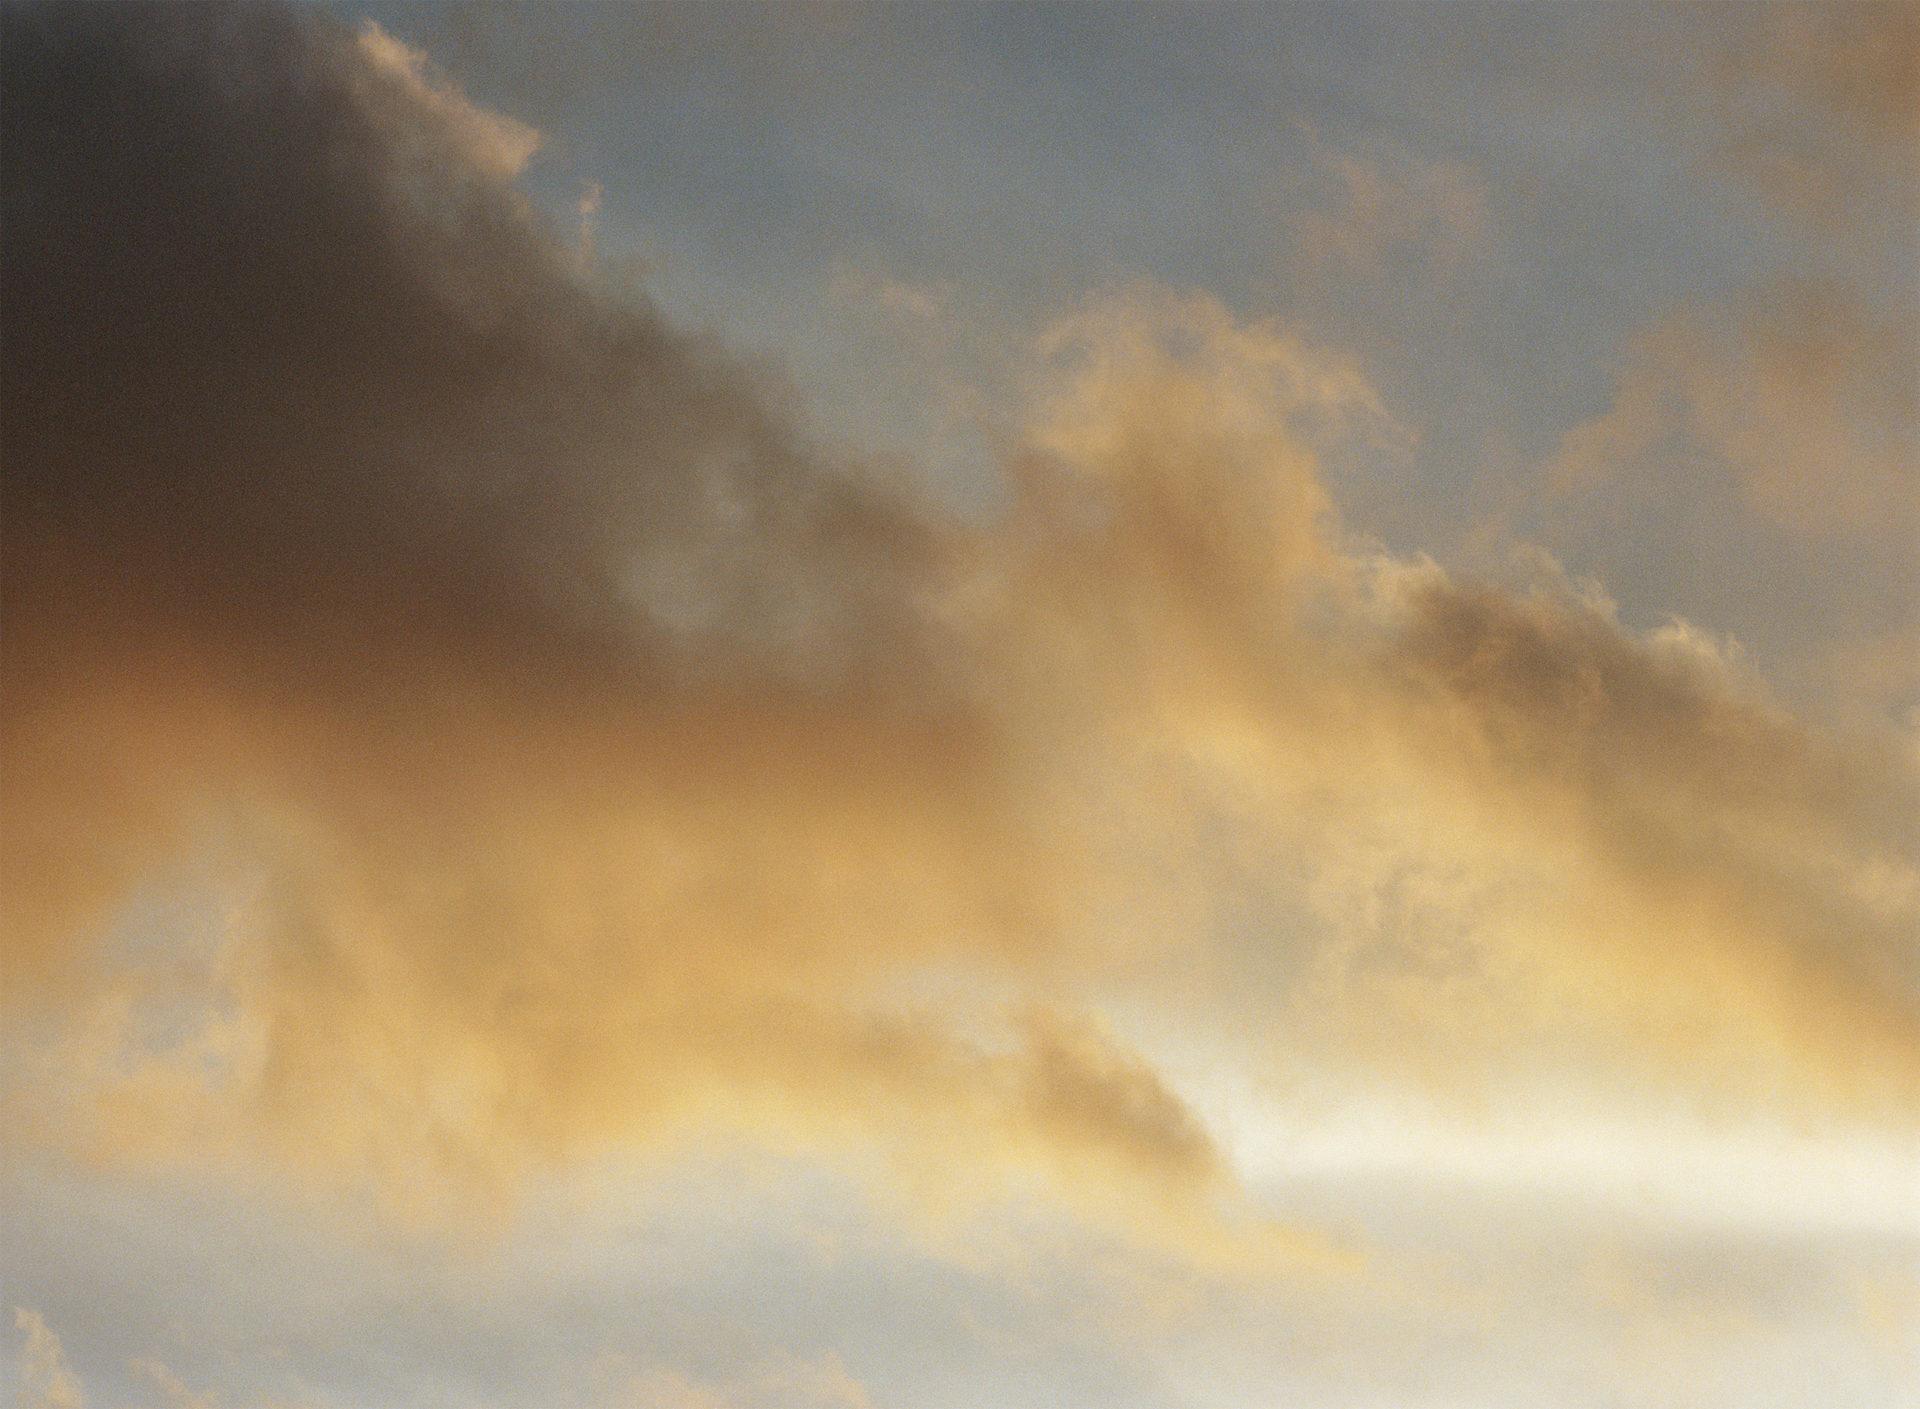 davidblack-cerrogordo-smog-1920x1409